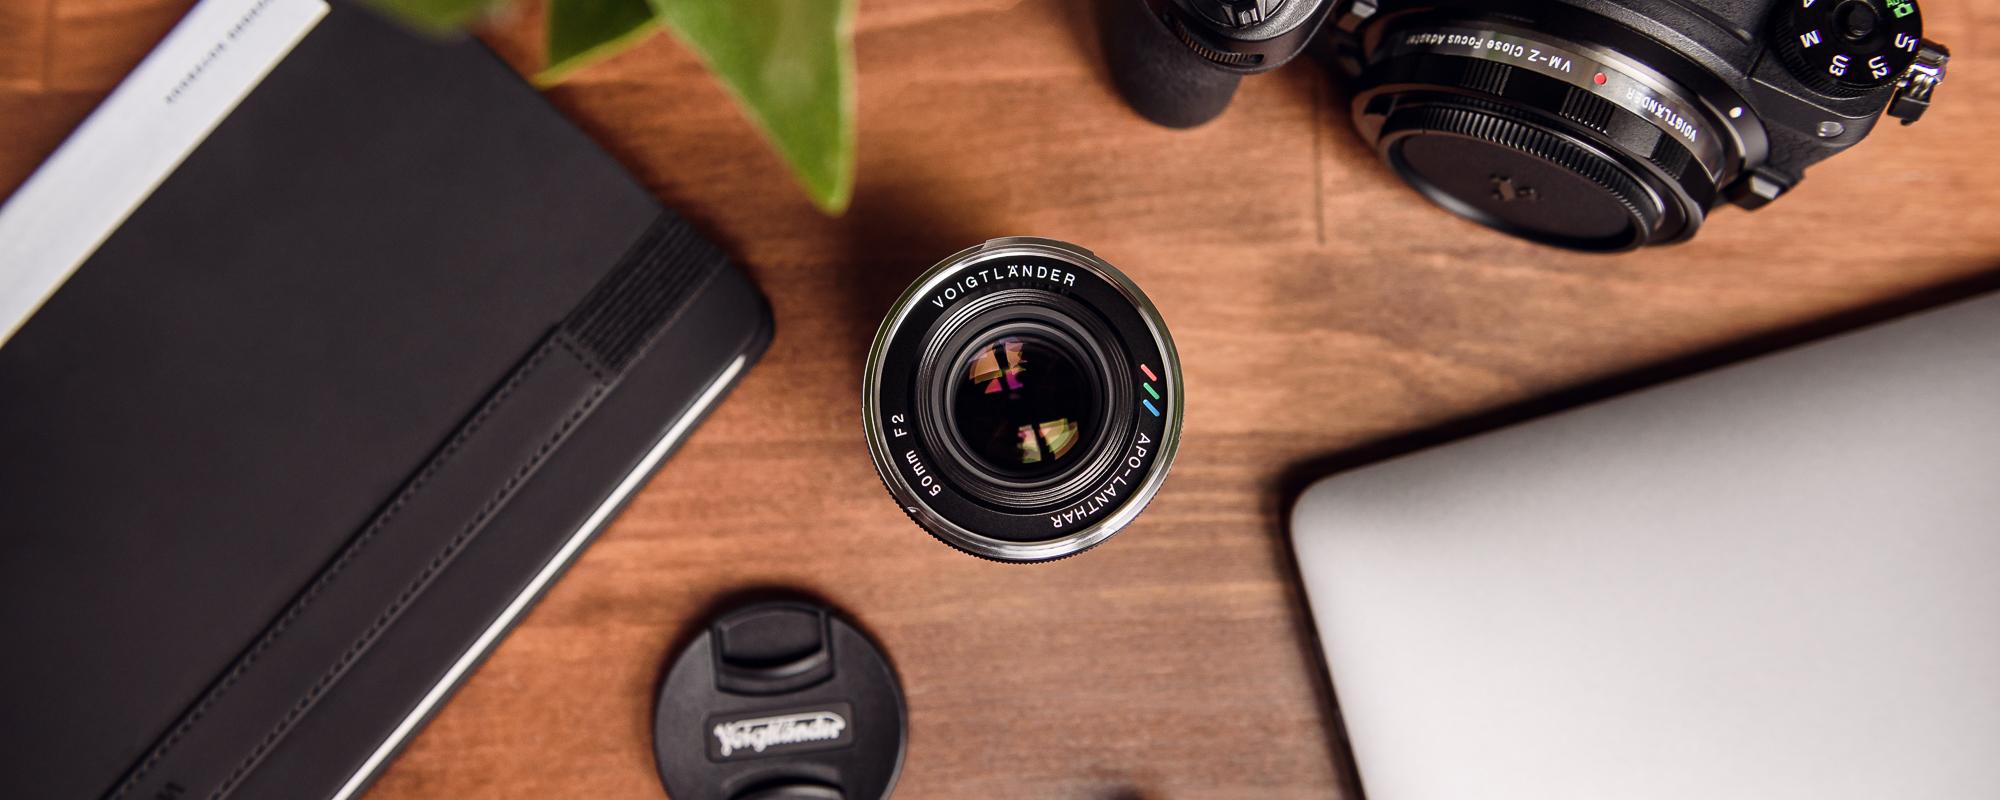 Voigtlander APO Lanthar 50 mm f/2.0 lens for Leica M on desk top